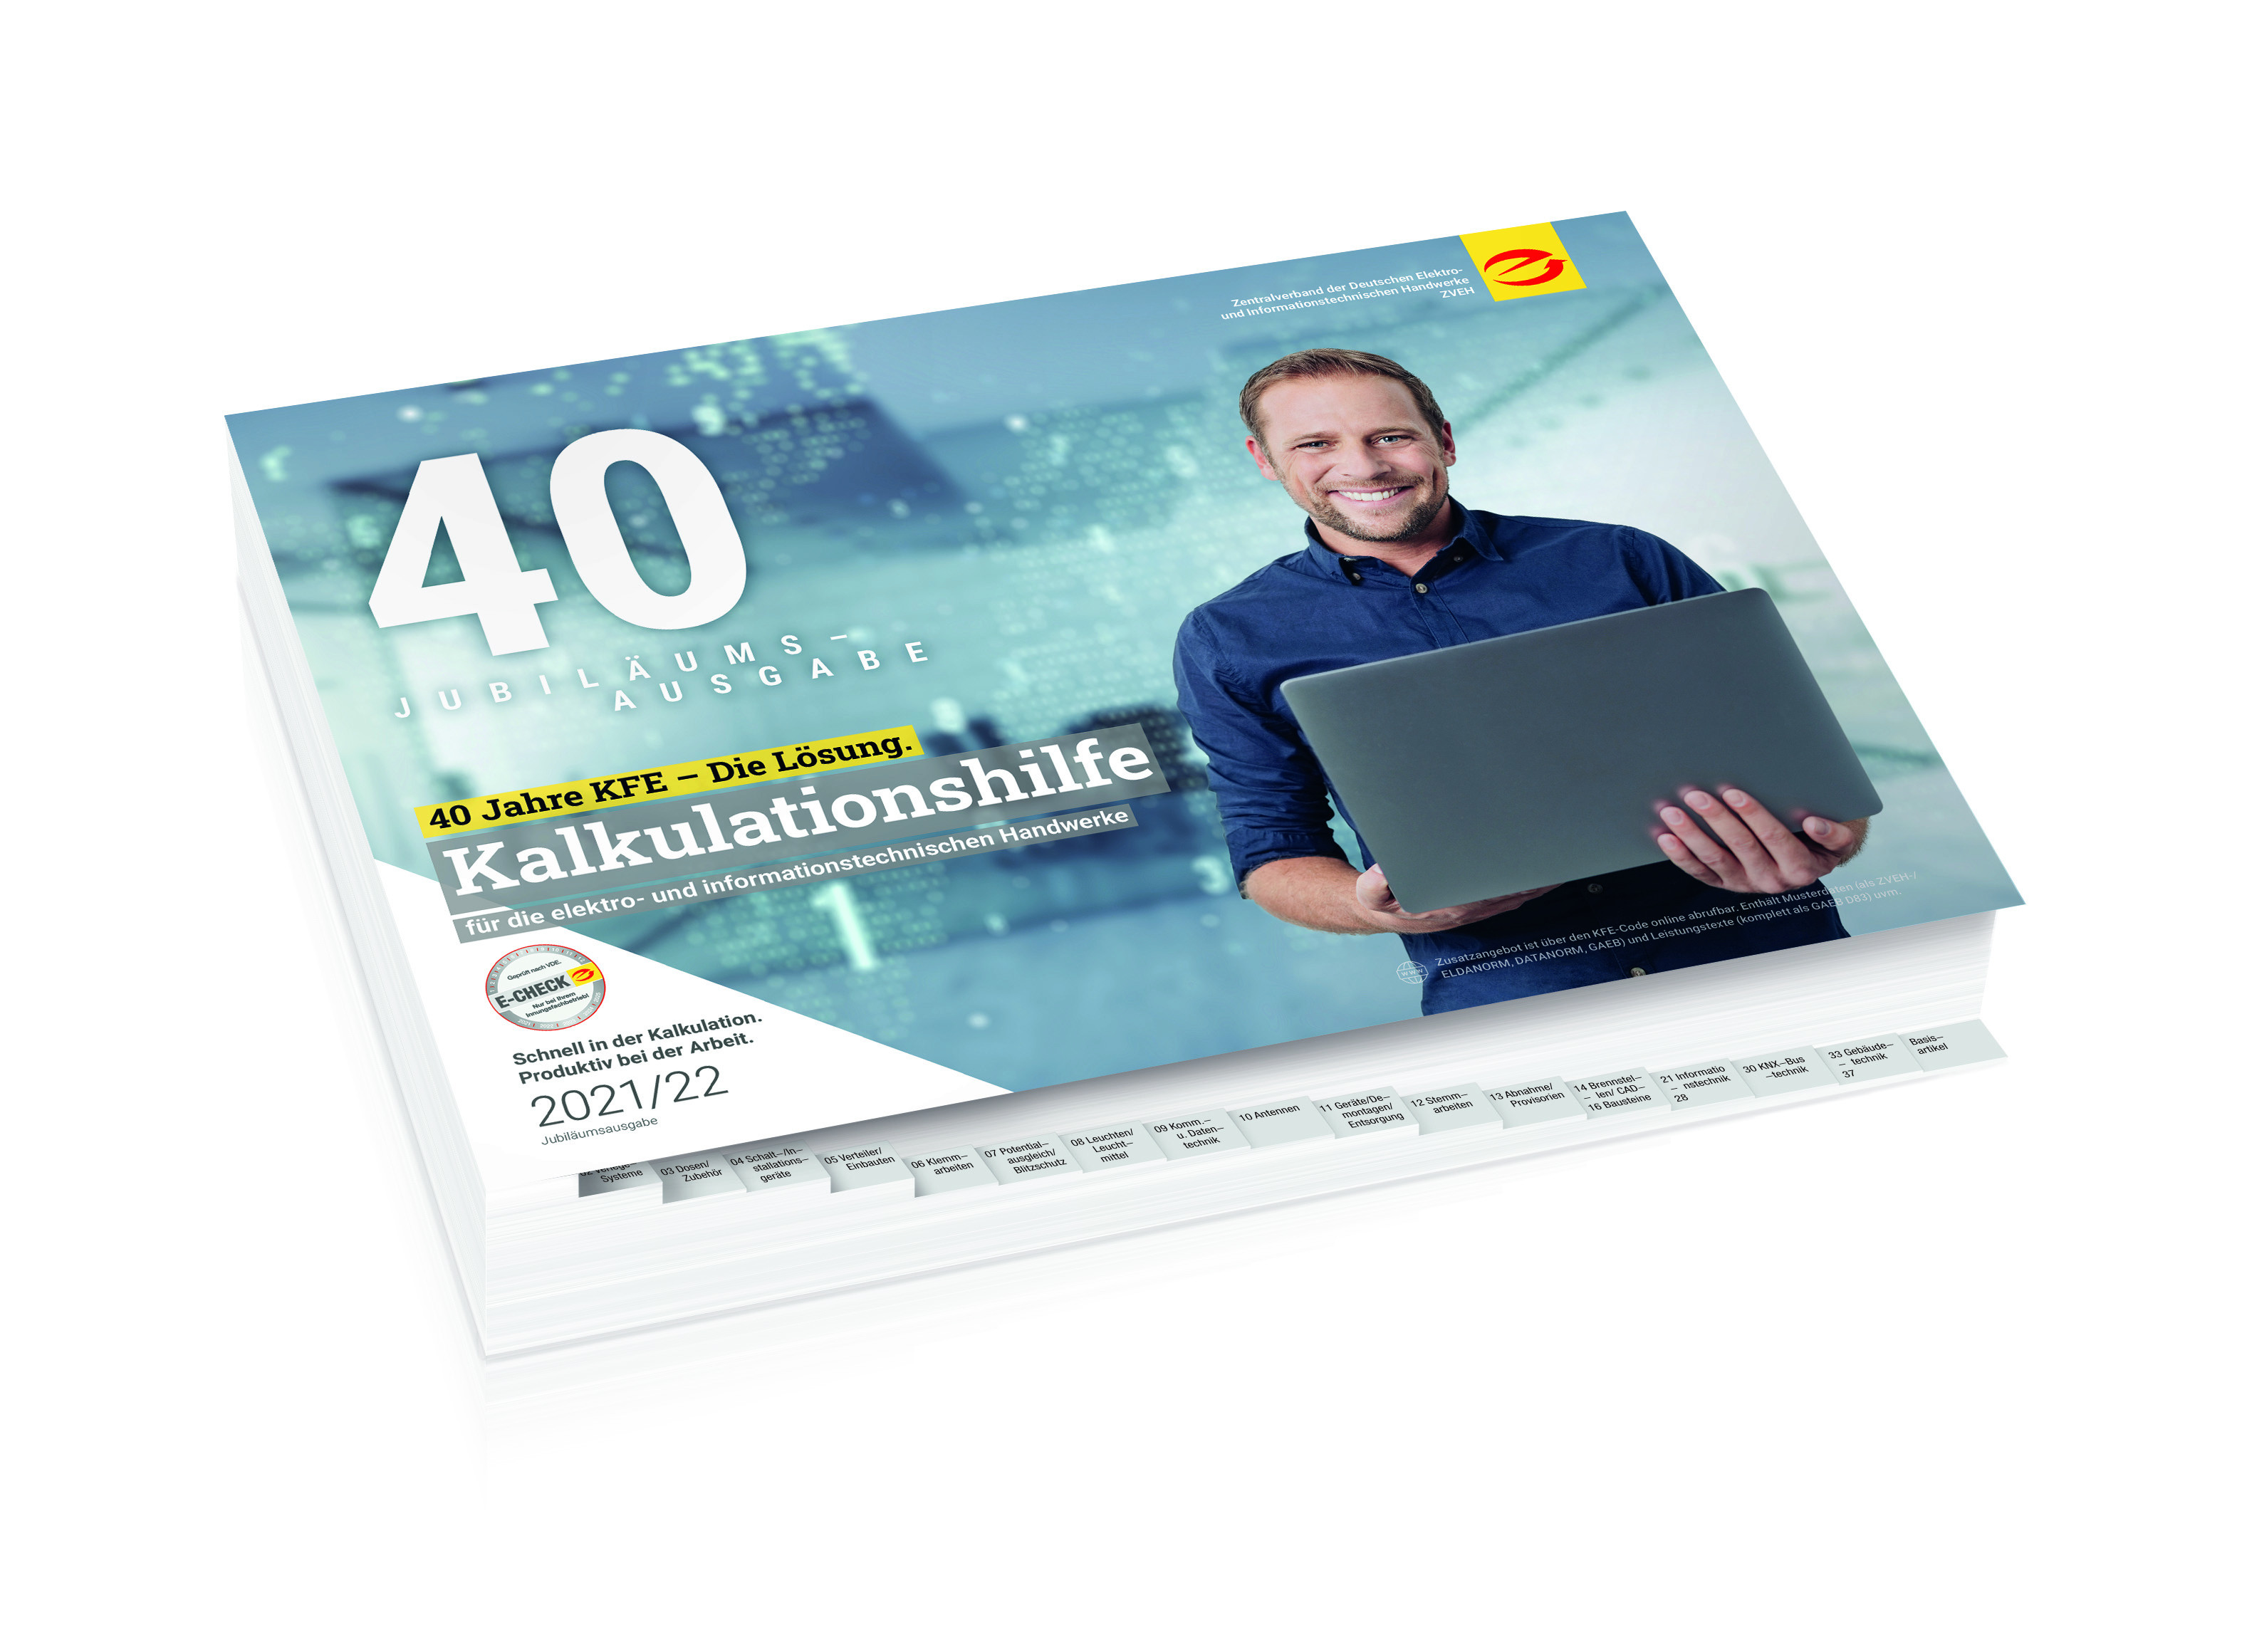 Kalkulationshilfe Buchausgabe 2021 / 22 (Lieferung ca. September 2021)